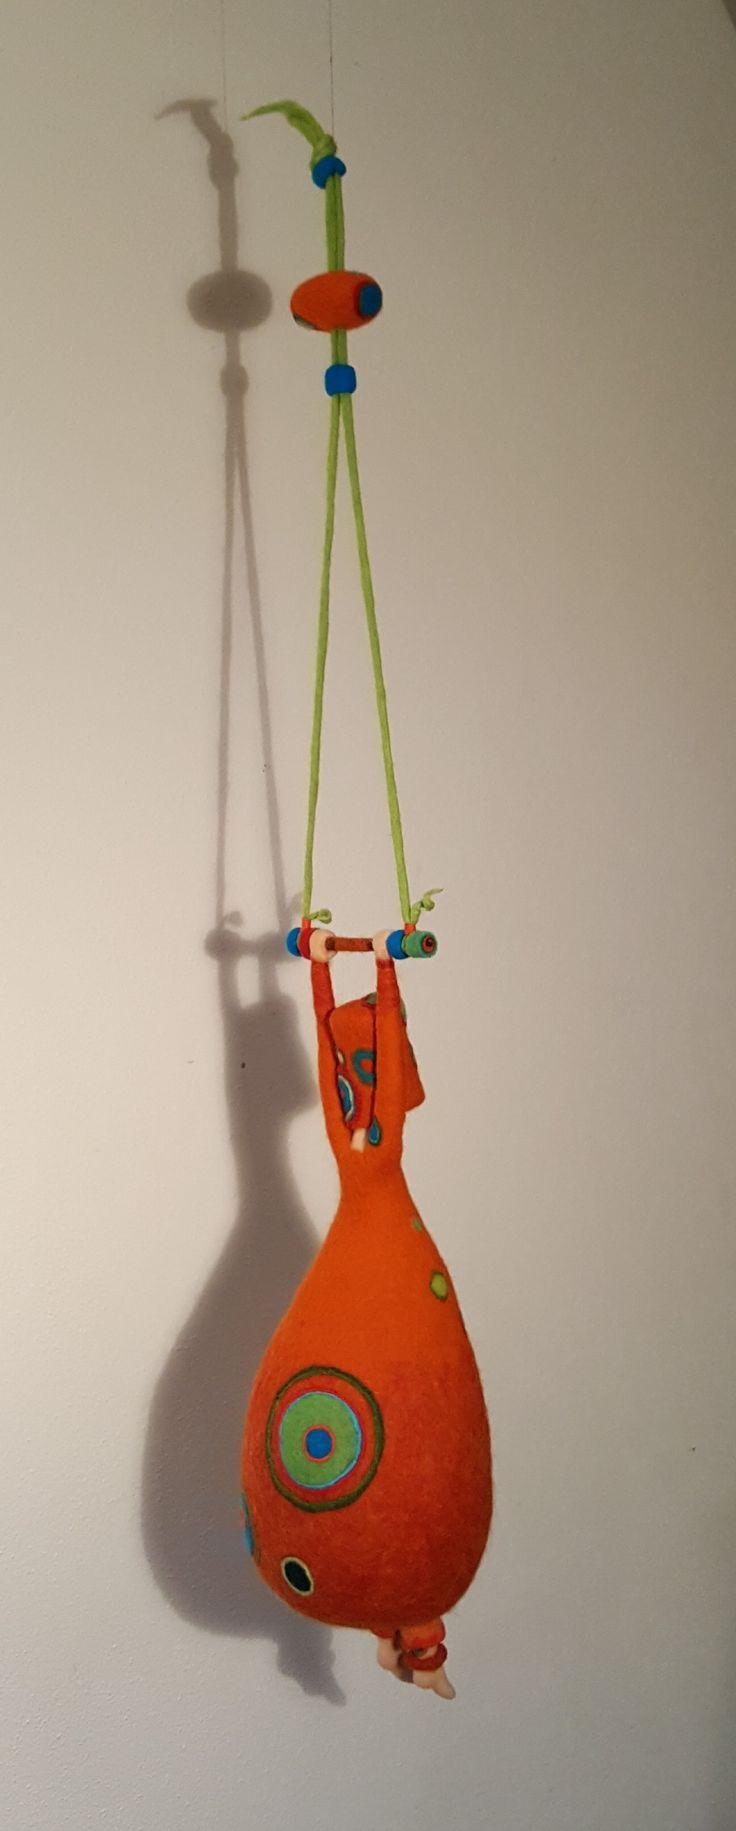 *Just hanging around* made by Paulien Sijtsema-Poort. www.wolinhout.nl.